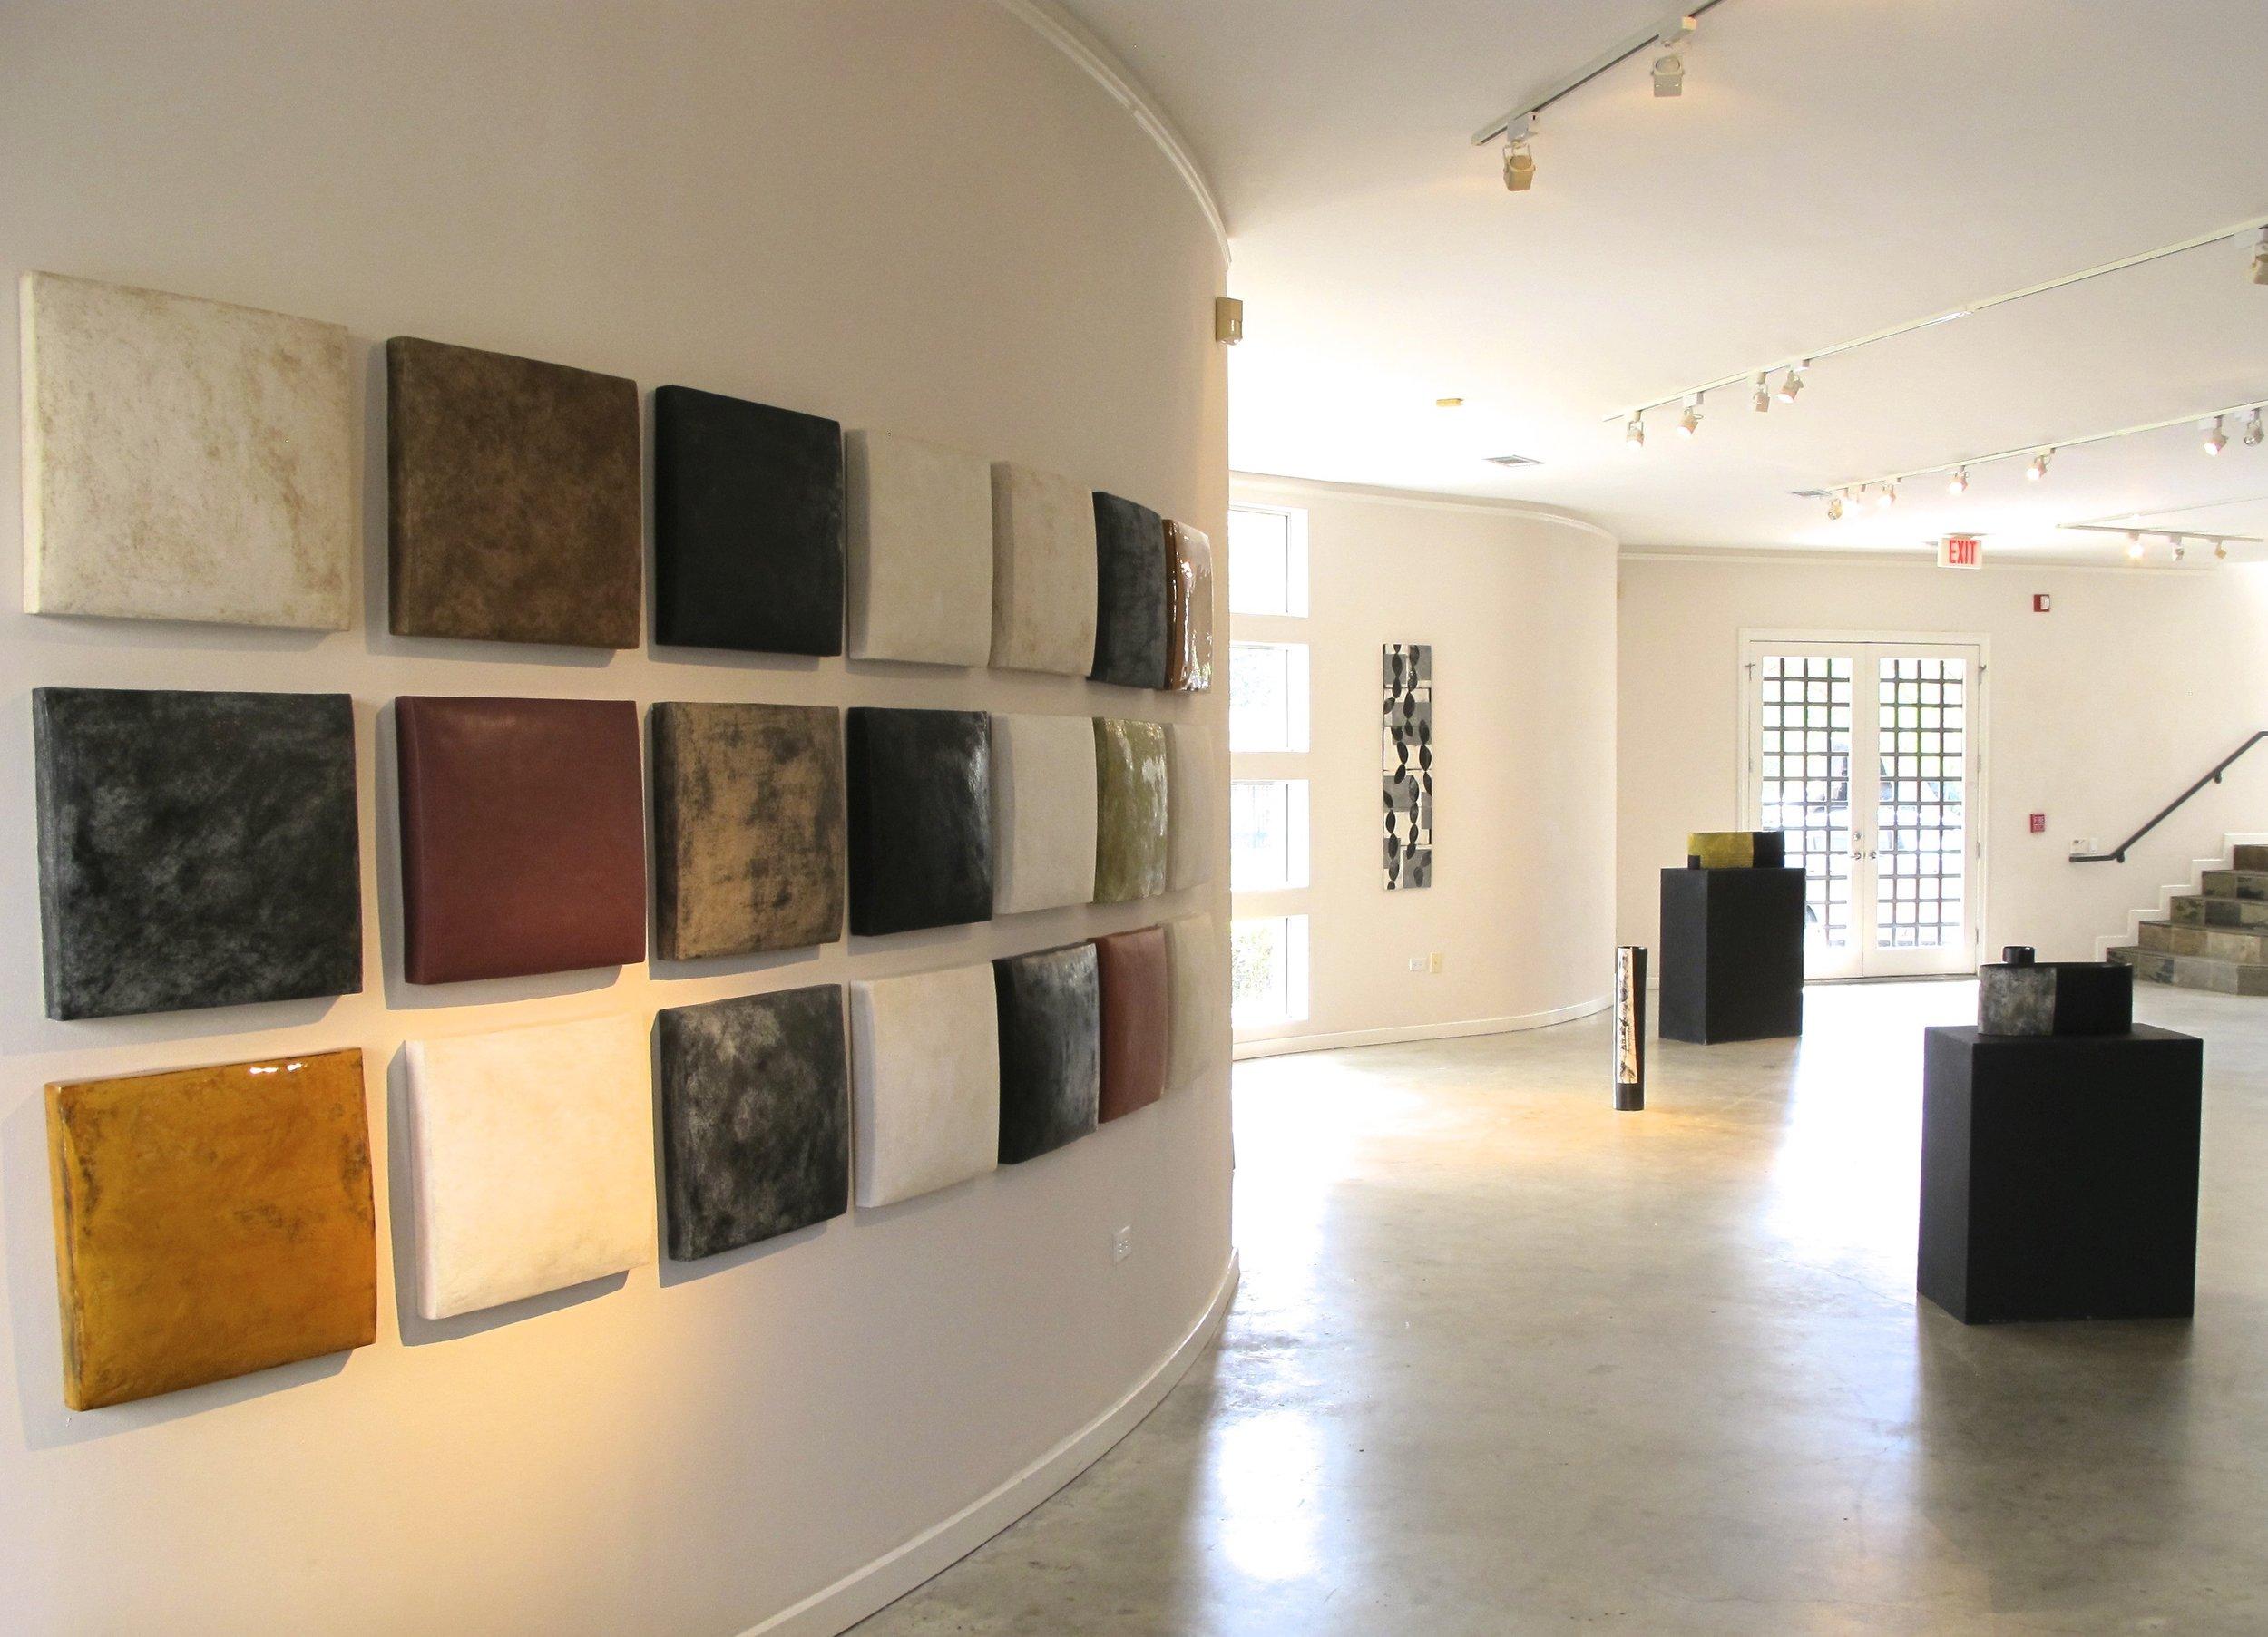 Kathy Erteman Installation